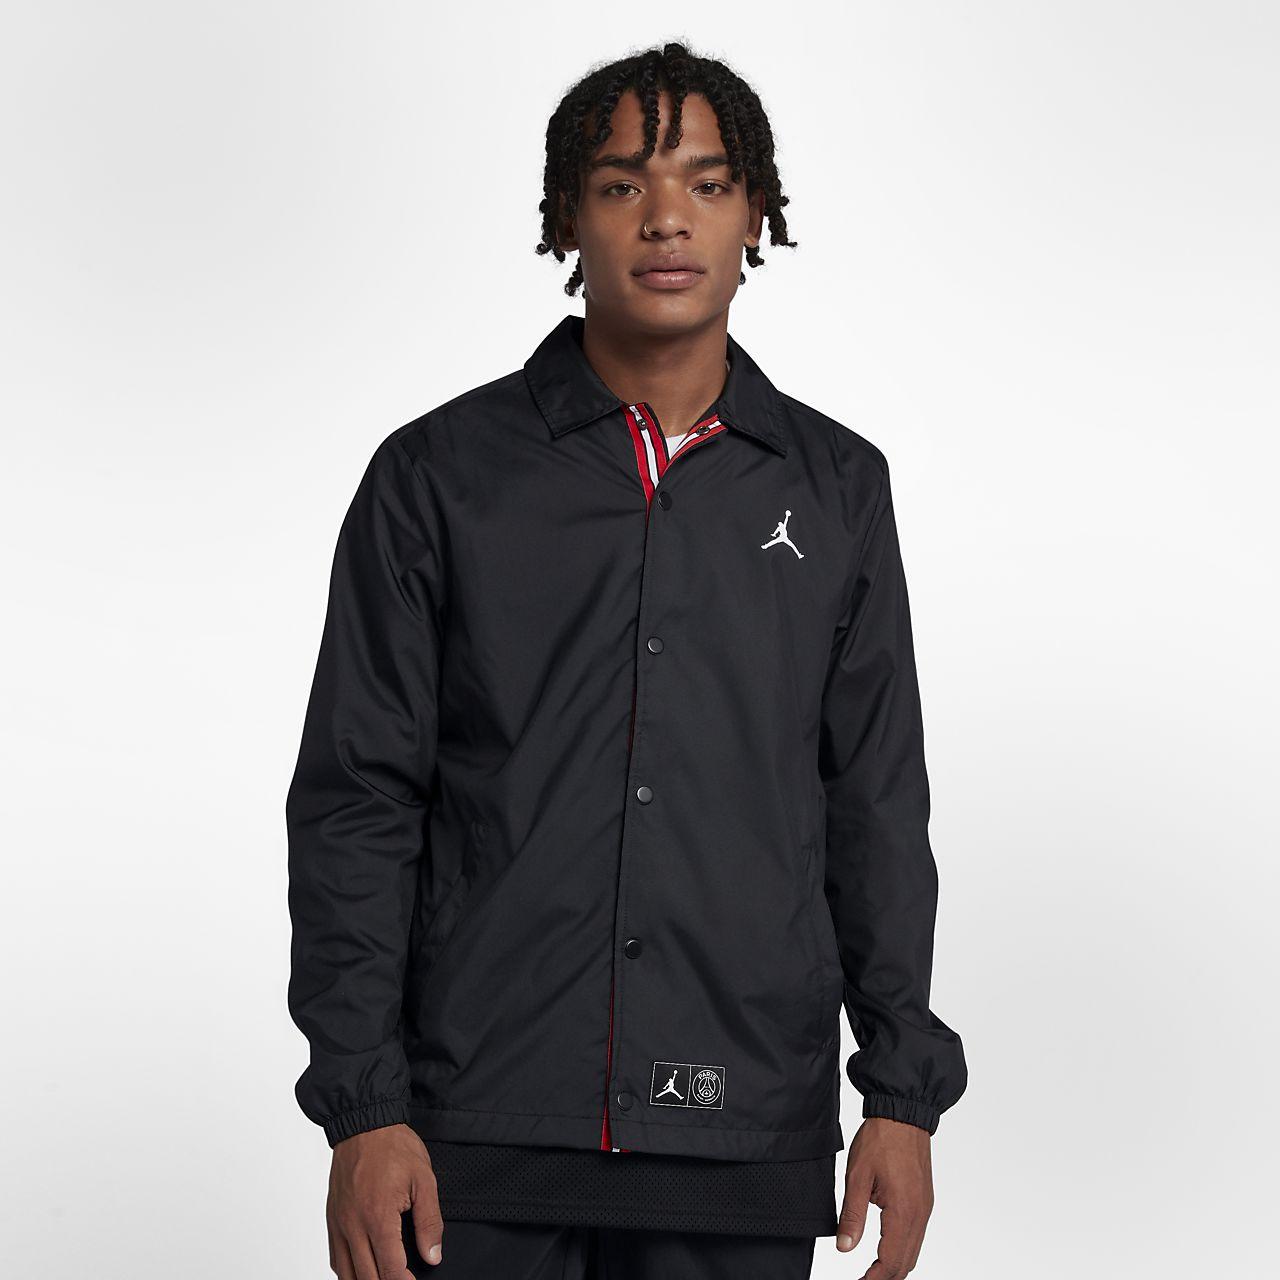 fcede588f00f64 Paris Saint-Germain Coaches Men s Jacket. Nike.com ID